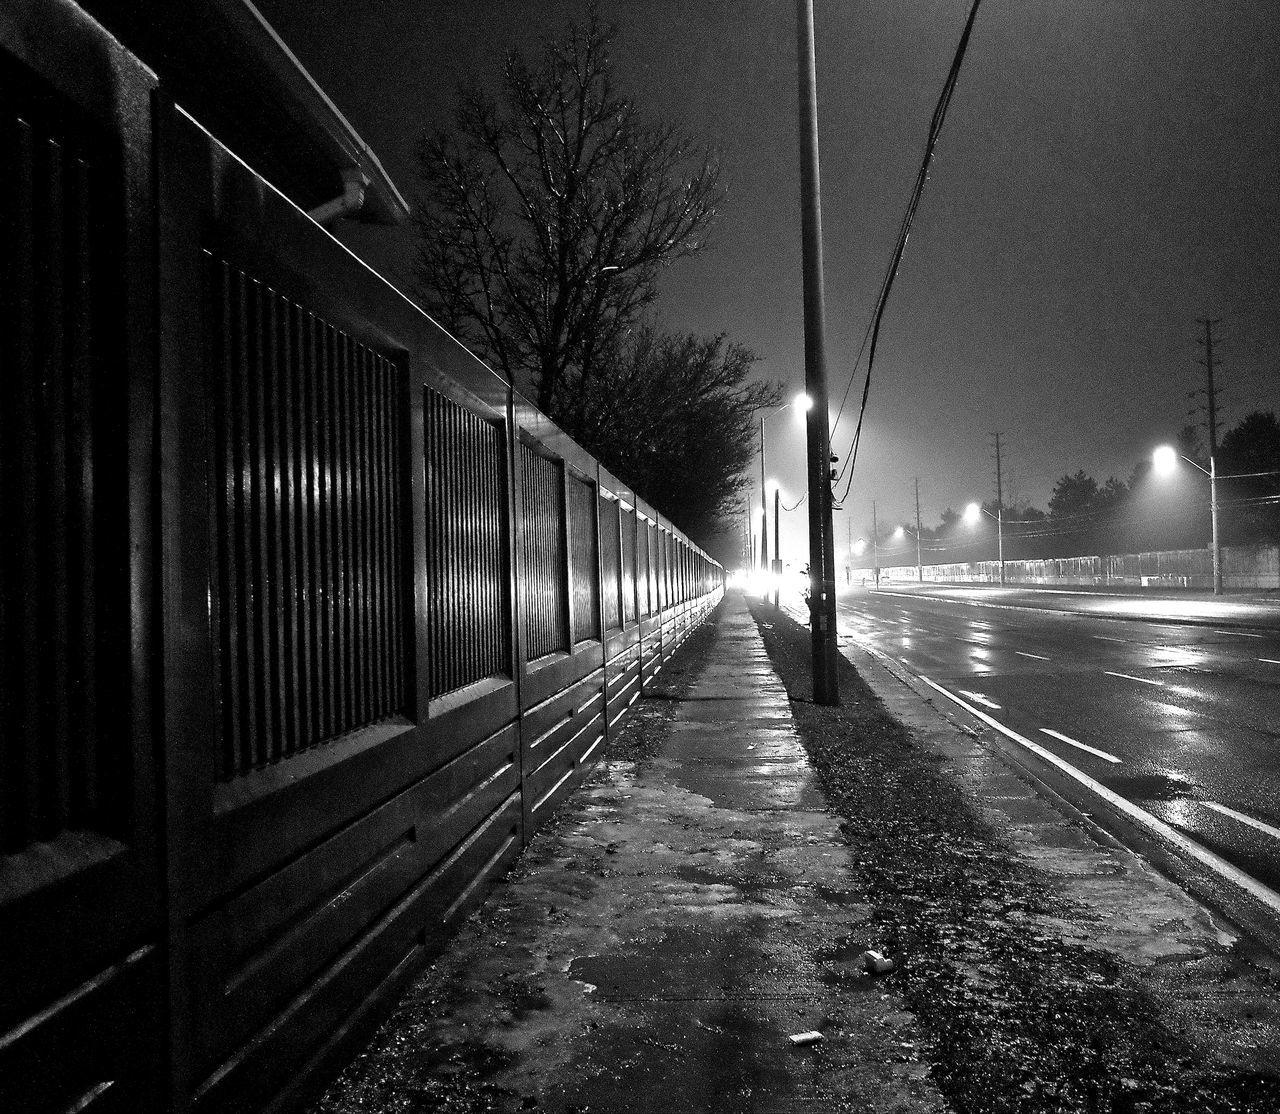 night, illuminated, street light, transportation, outdoors, tree, no people, the way forward, sky, architecture